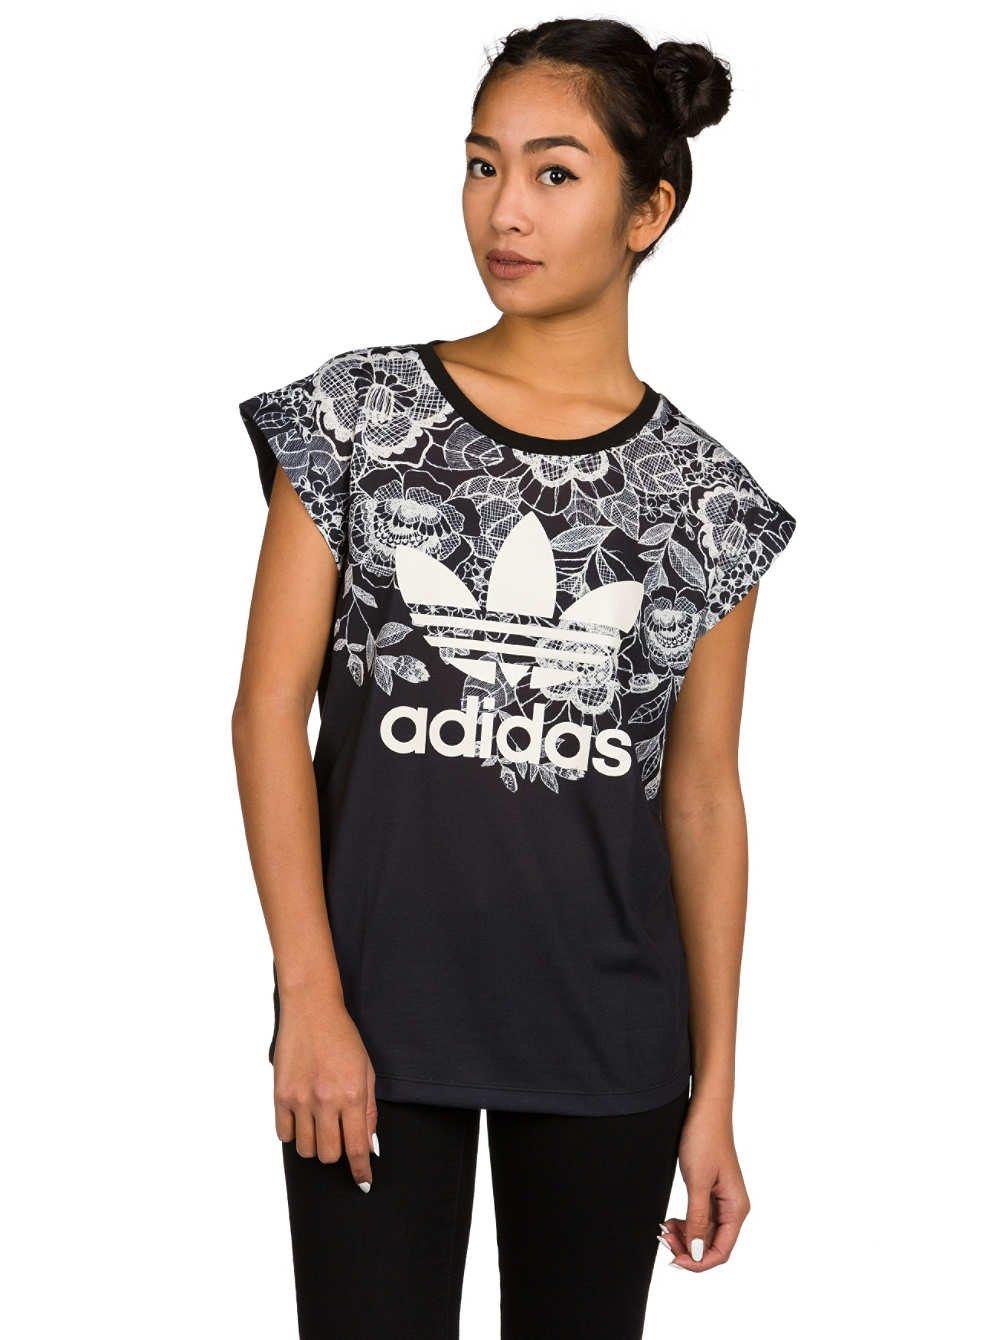 adidas shirt damen boyfriend